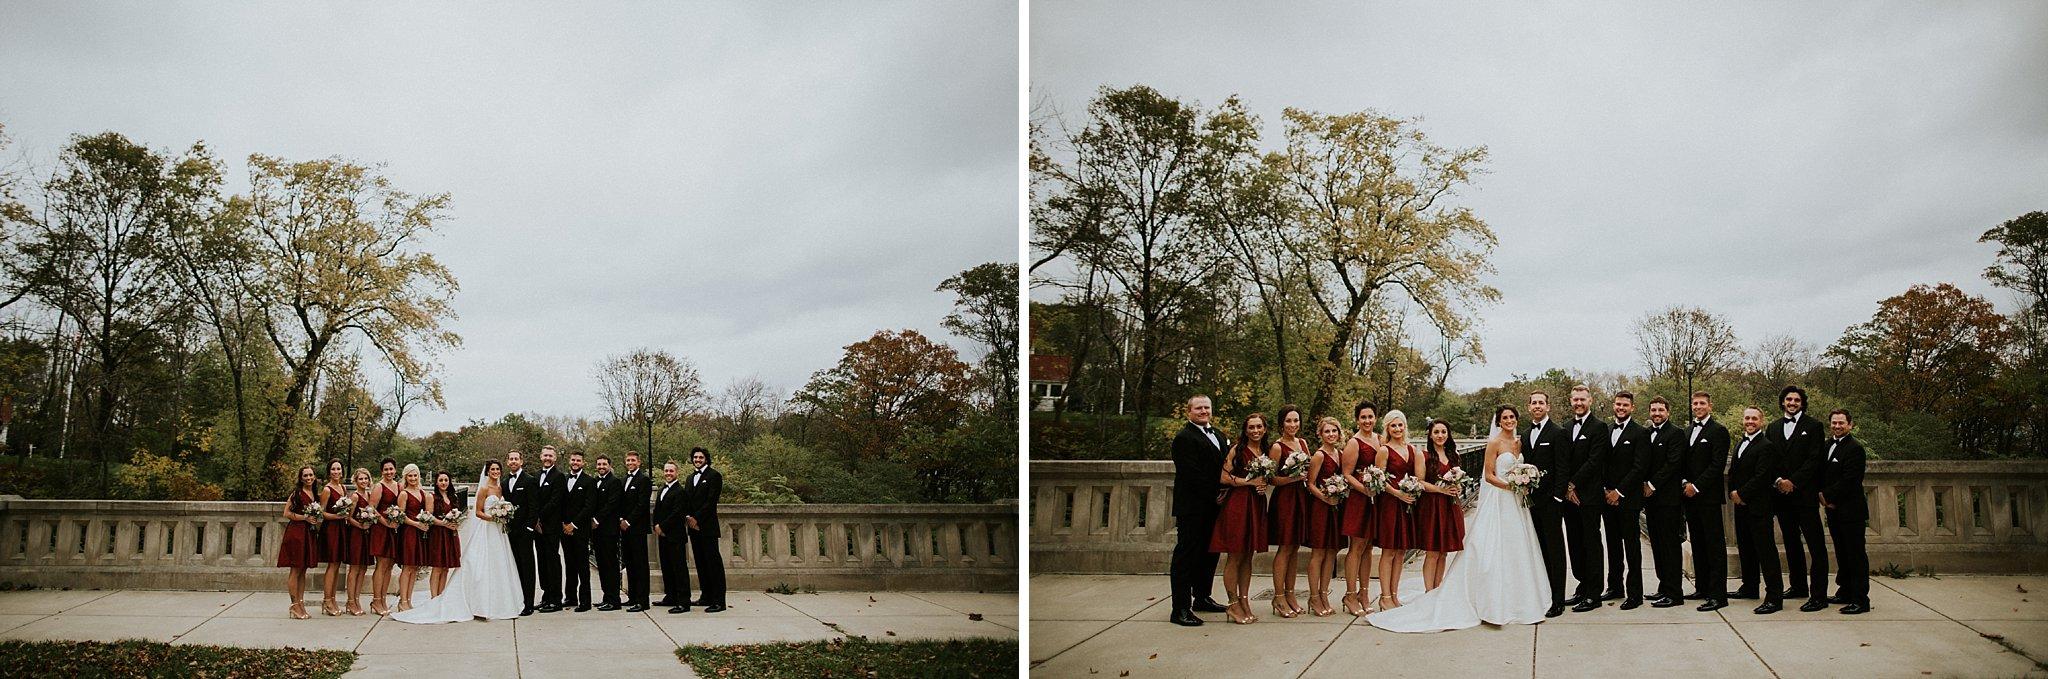 Matt-Lauren_St-Marys_Hilton-City-Center-Milwaukee-Wedding_liller-photo_0034.jpg